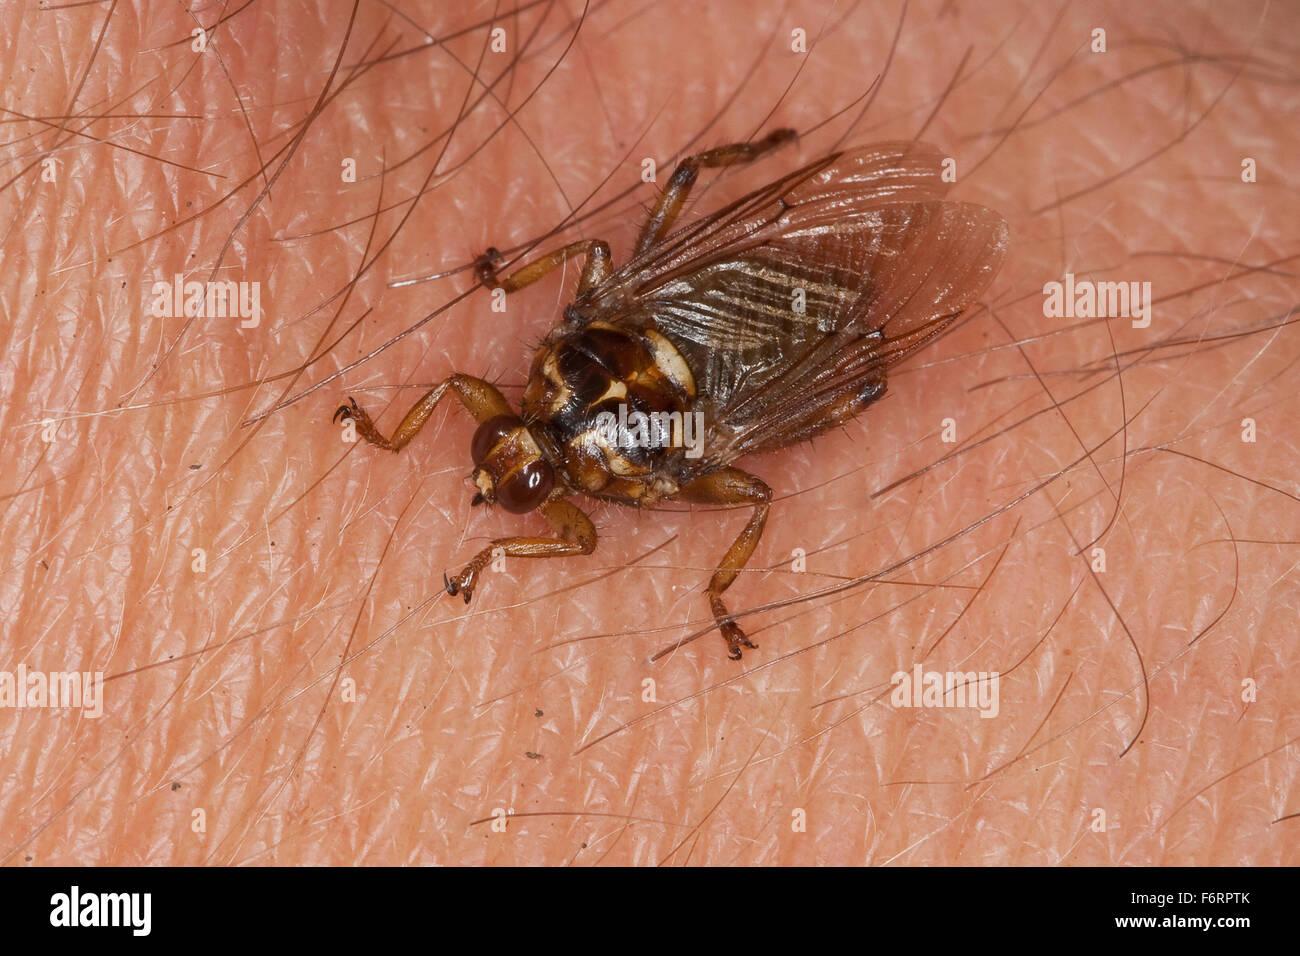 Forest-fly, louse fly, louse flies, Pferdelausfliege, Pferde-Lausfliege, Lausfliege, Lausfliegen, Blutsauger, Hippobosca - Stock Image